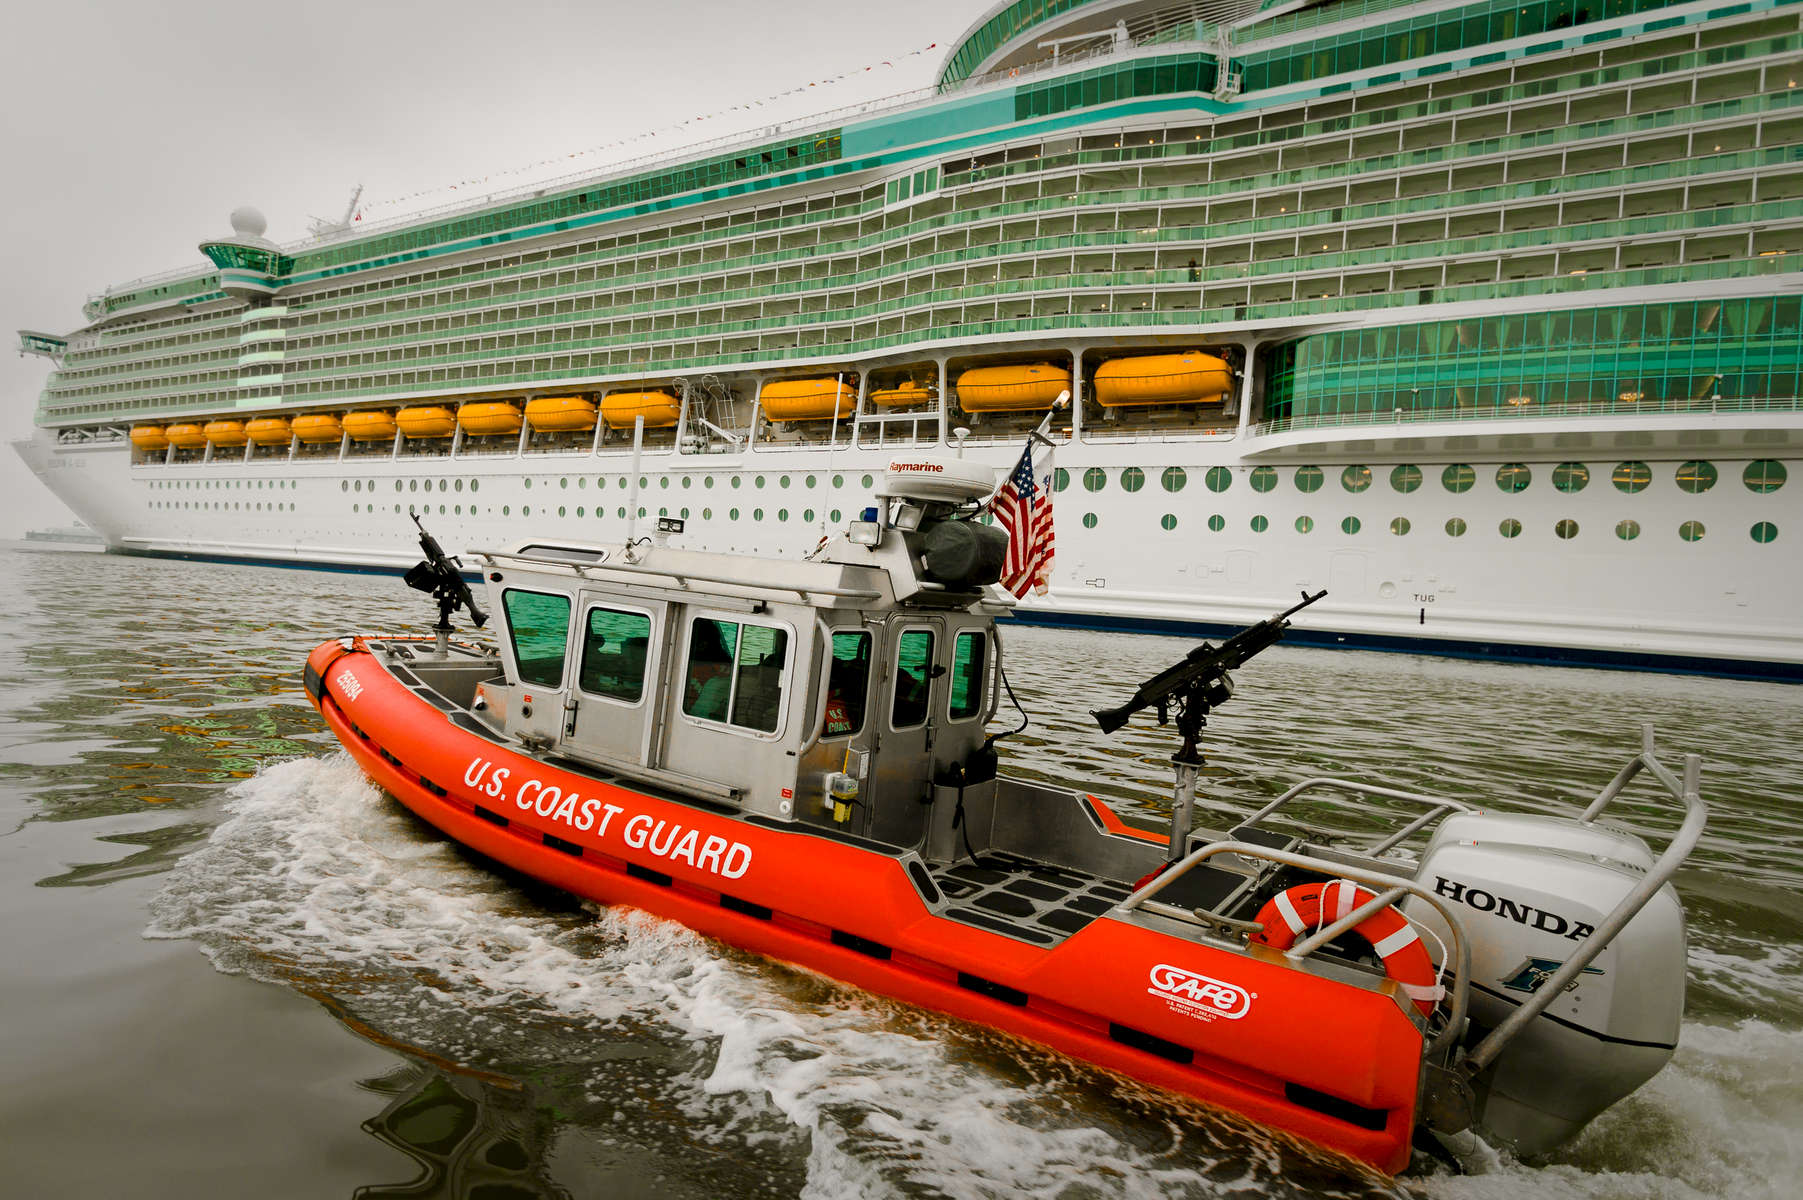 MSST USCG-Freedom of the Seas